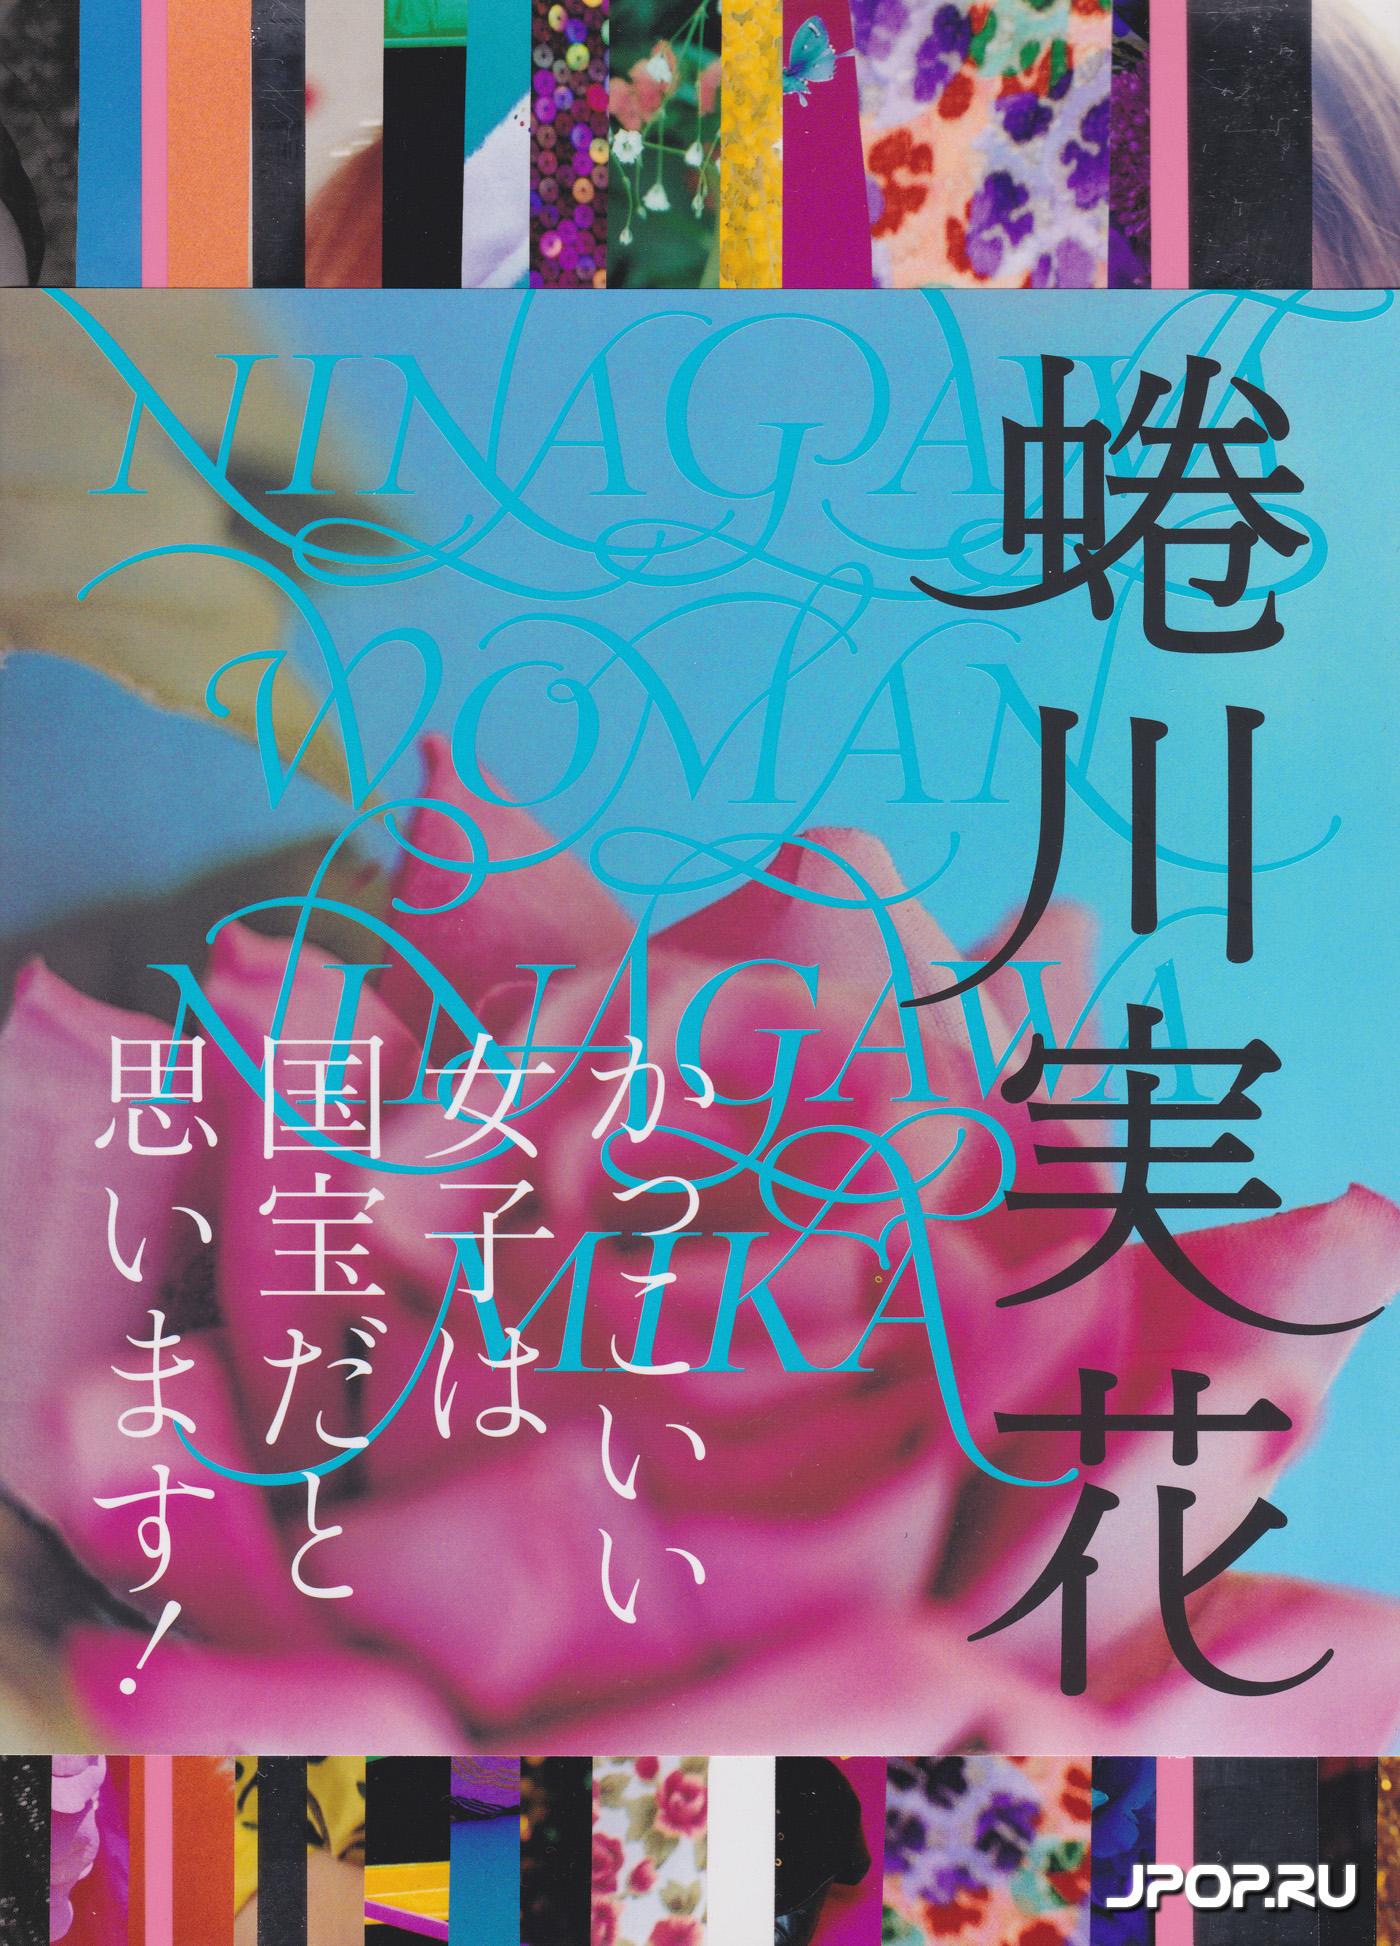 20180124.0359.1 Mika Ninagawa - Ninagawa Woman (photobook) 001 (JPOP.ru).jpg